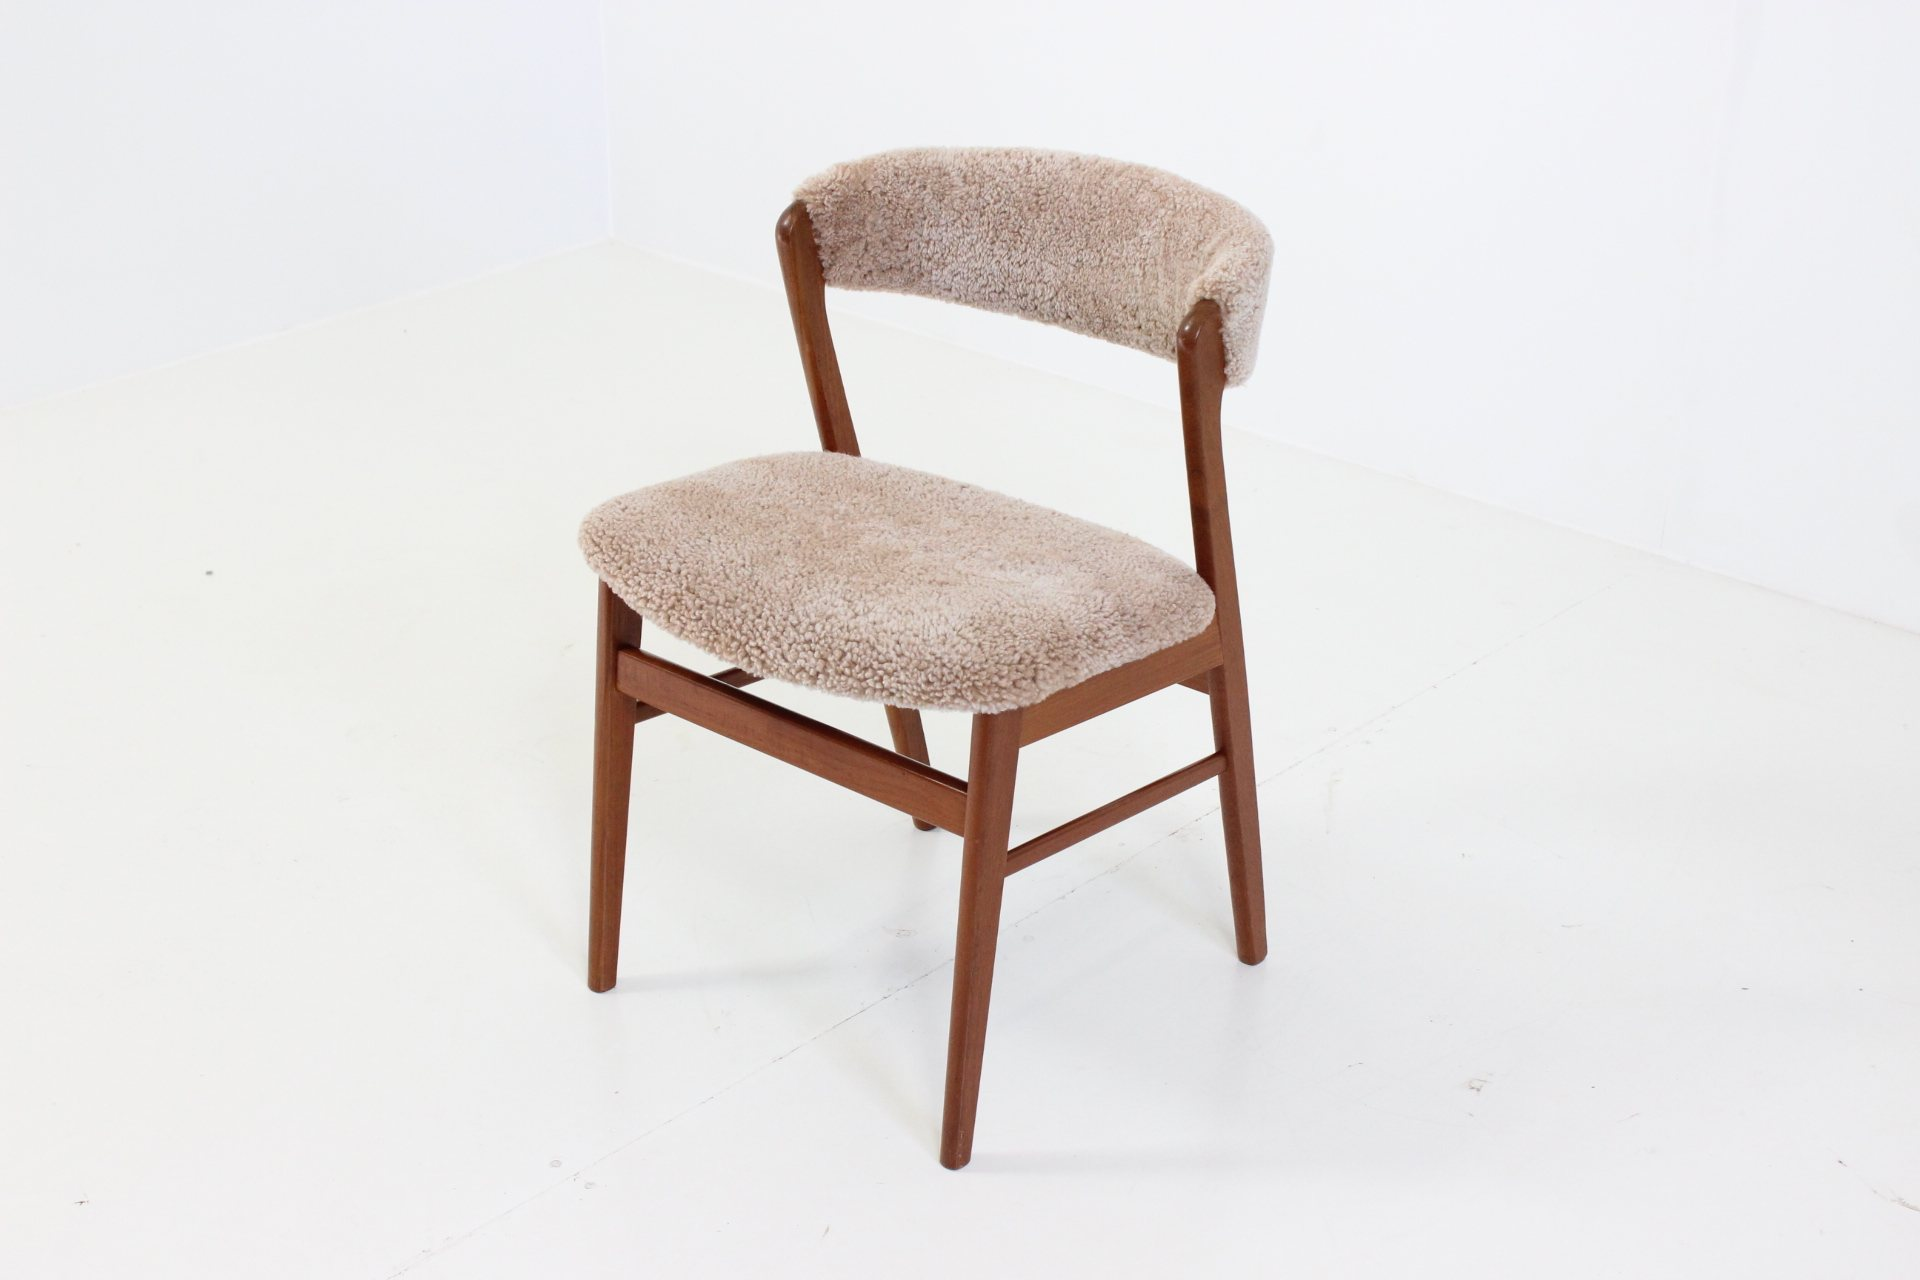 Side chair by kai kristiansen for h ng stolefabrik davint design - Kai kristiansen chairs ...